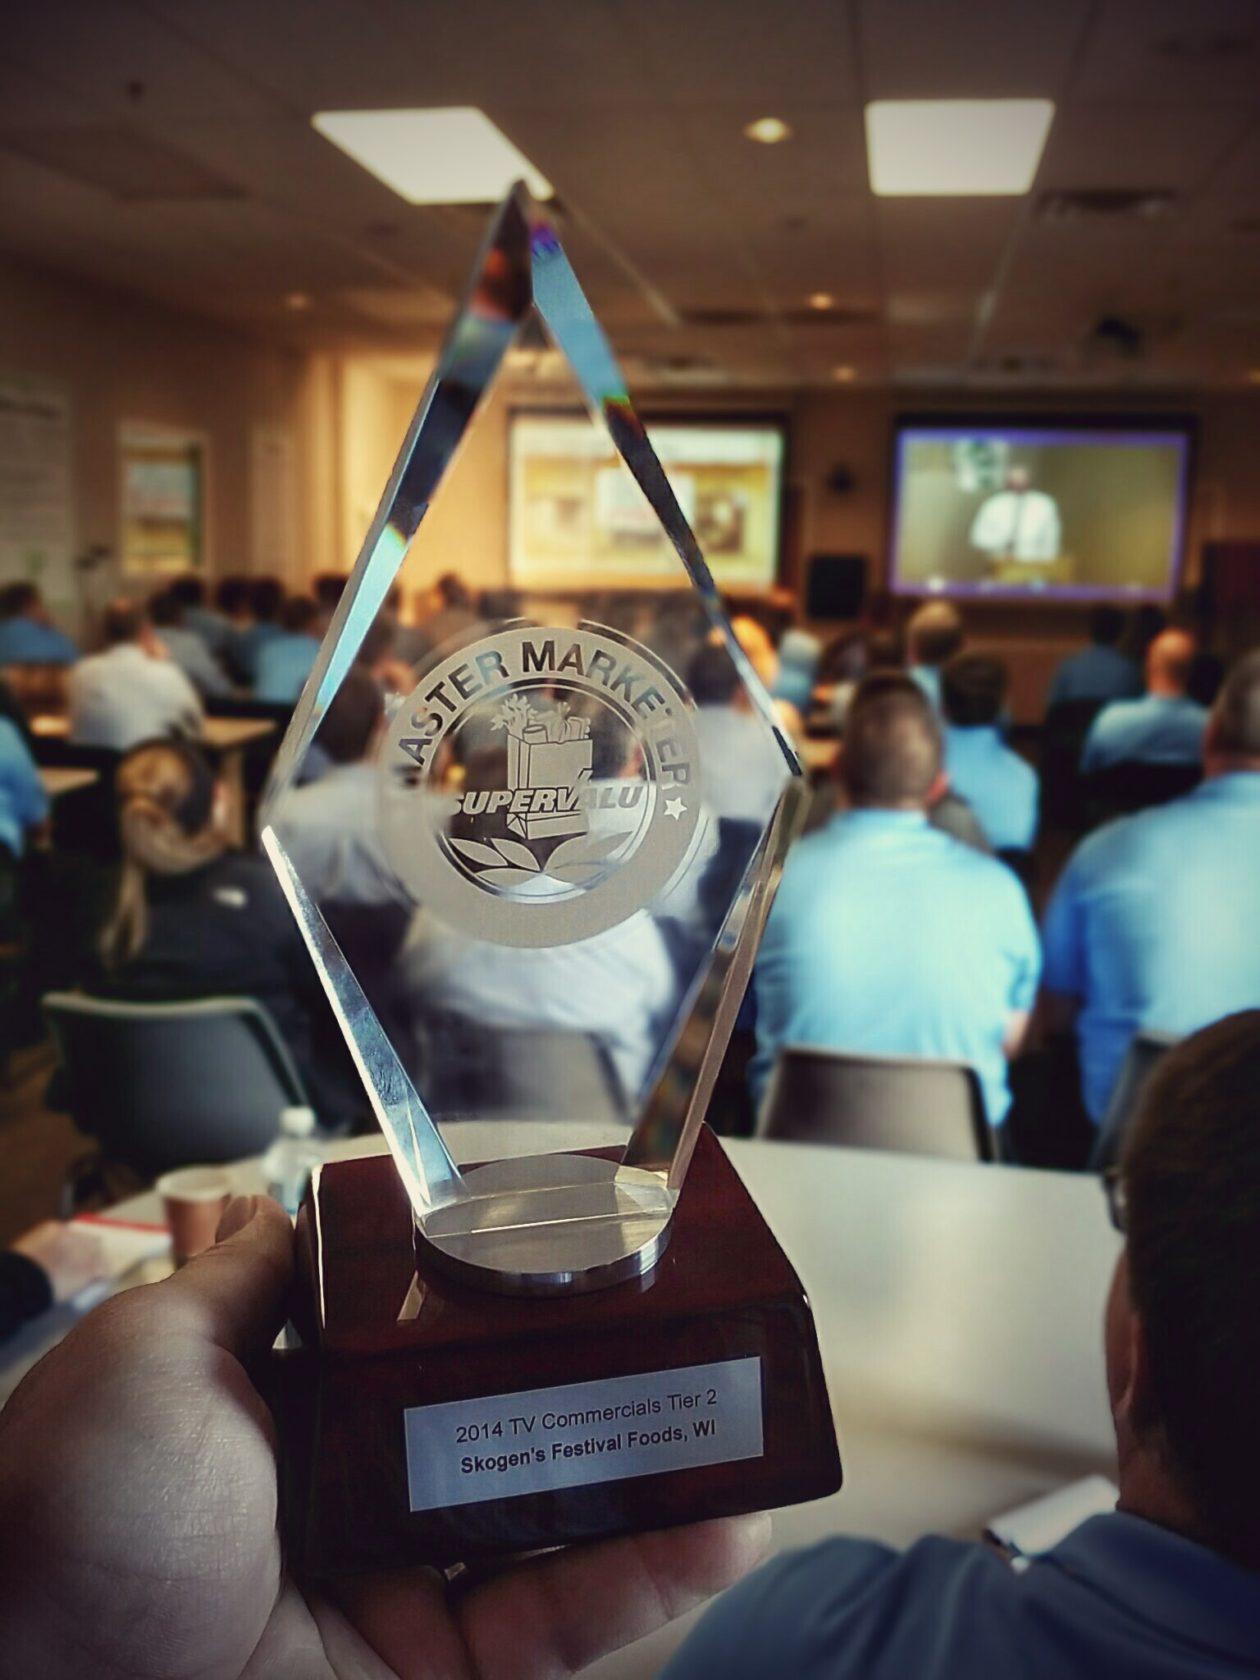 Creative Edge Wins National Award for Festival Foods TV Ad ...